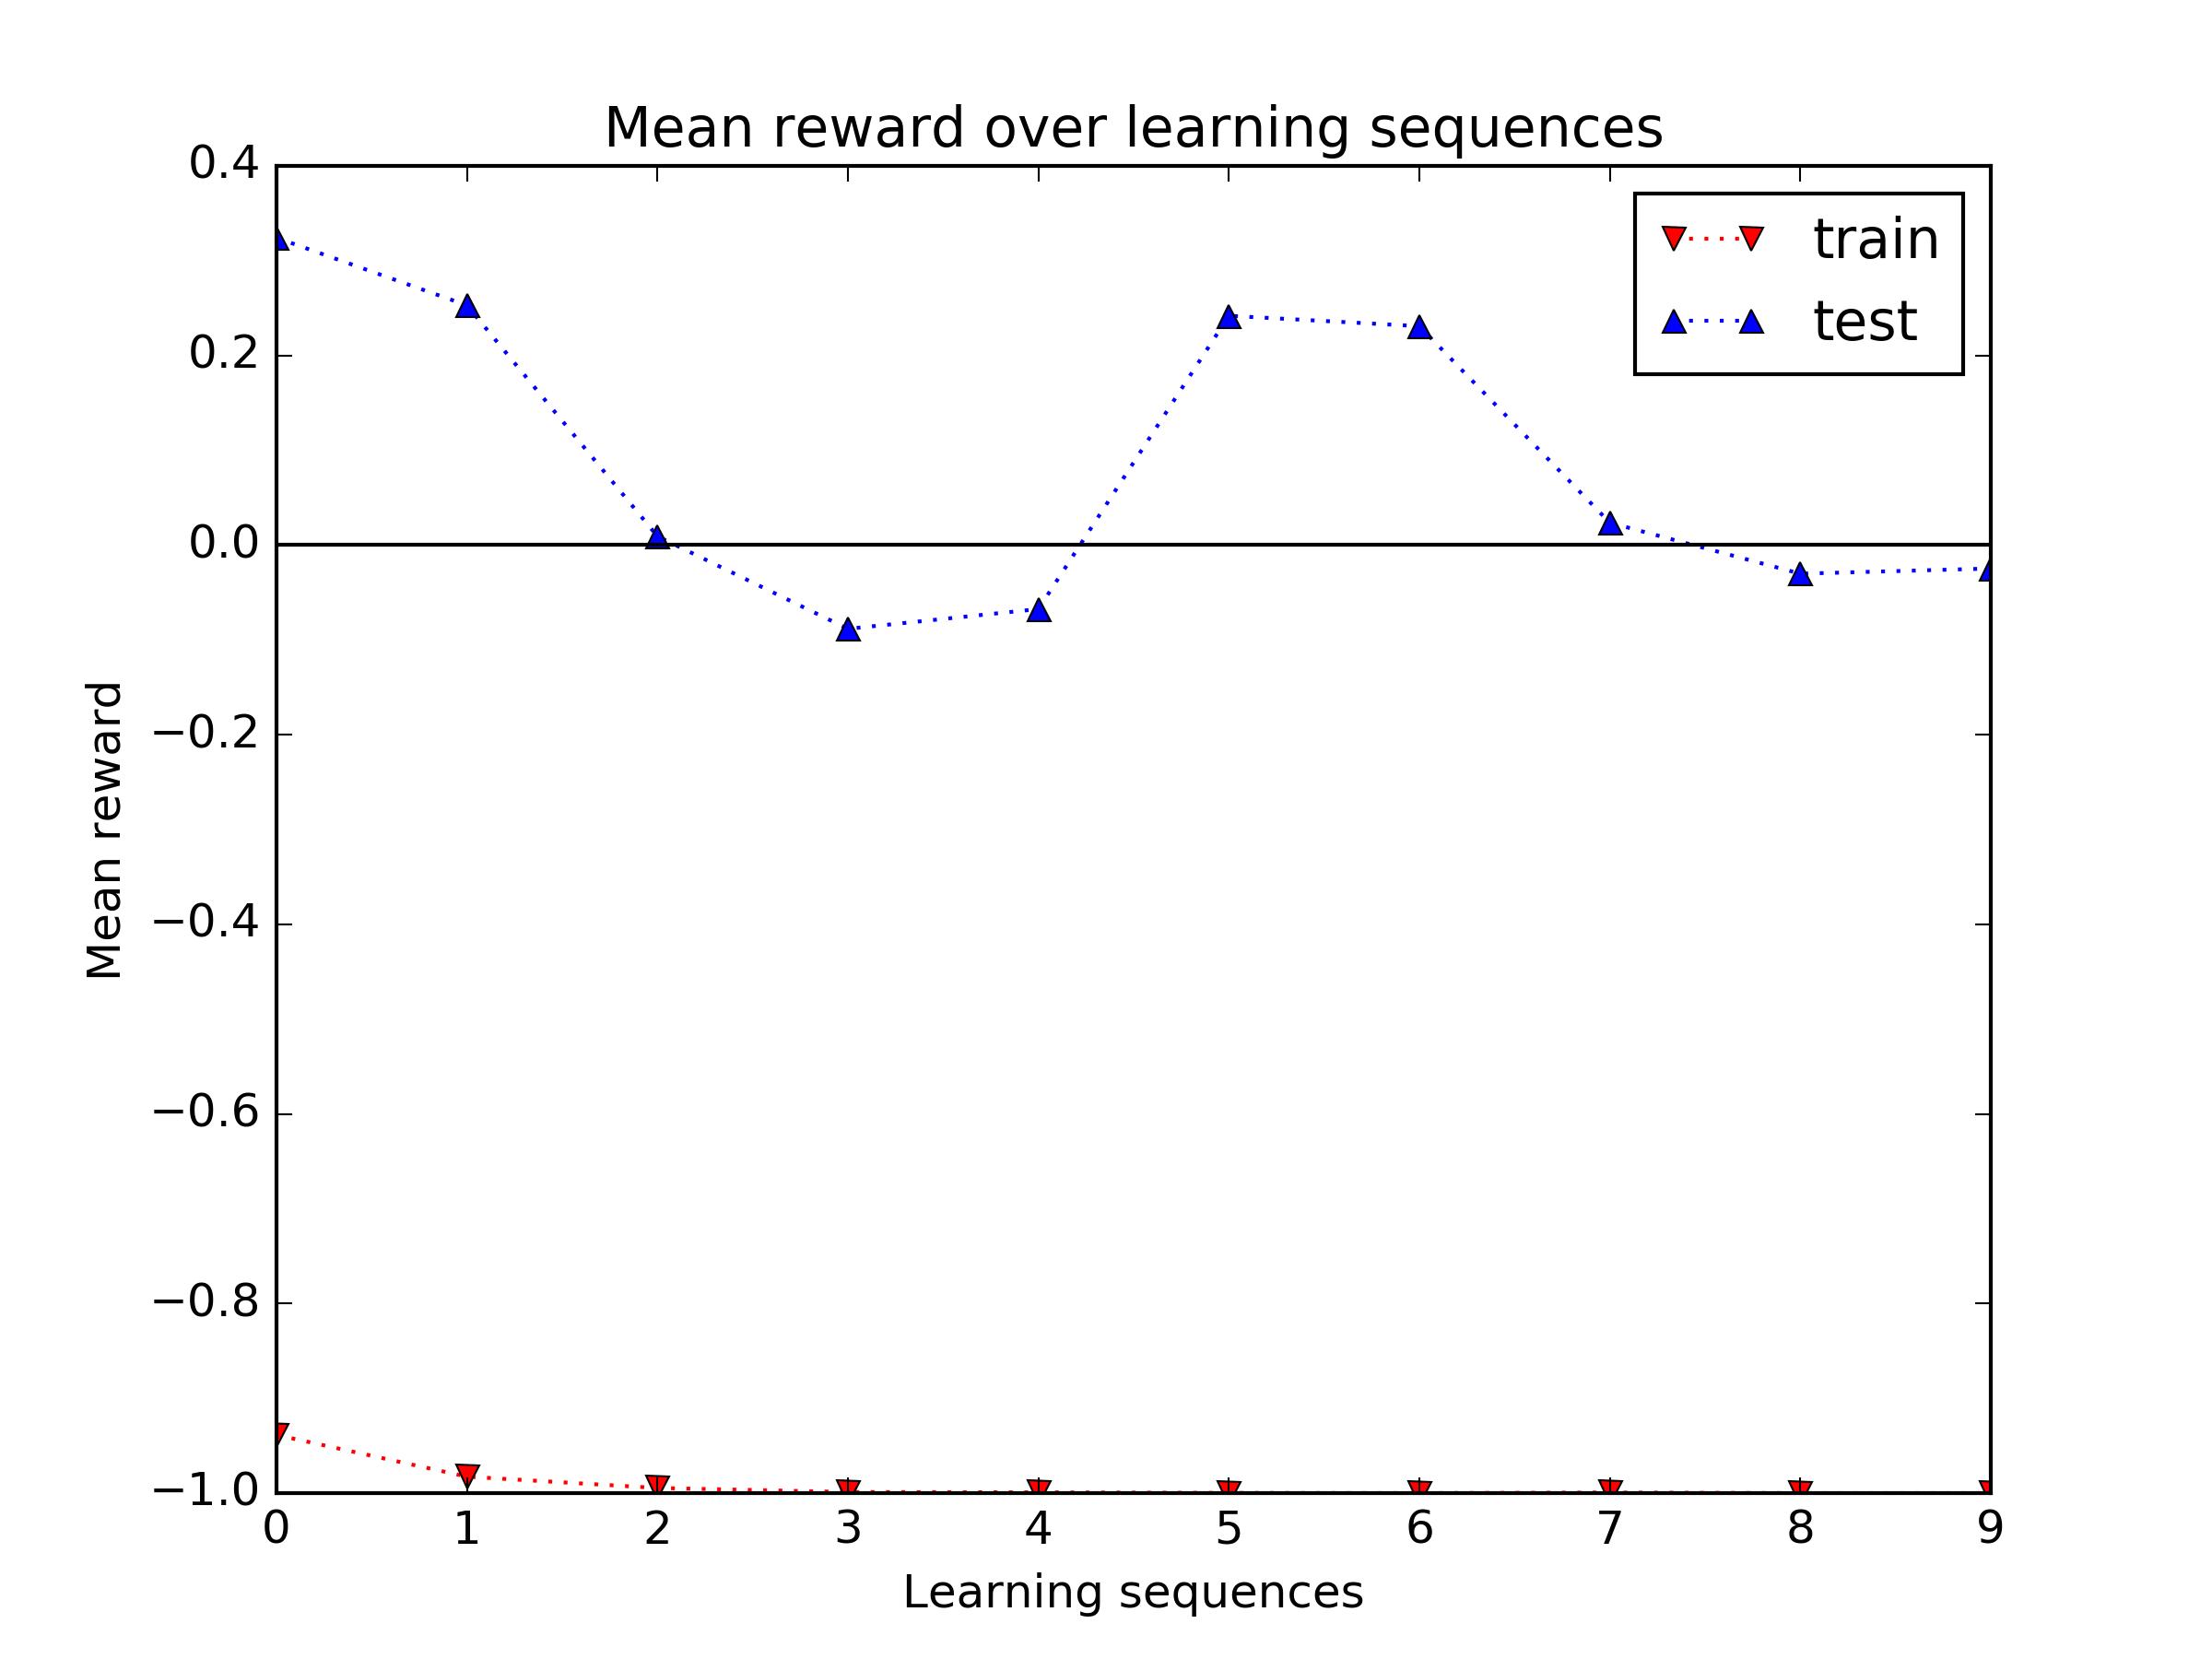 Lors de l'adaptation, le reward moyen oscille entre 0.3 et -0.1 alors que le reward moyen lors de l'apprentissage est de -1.